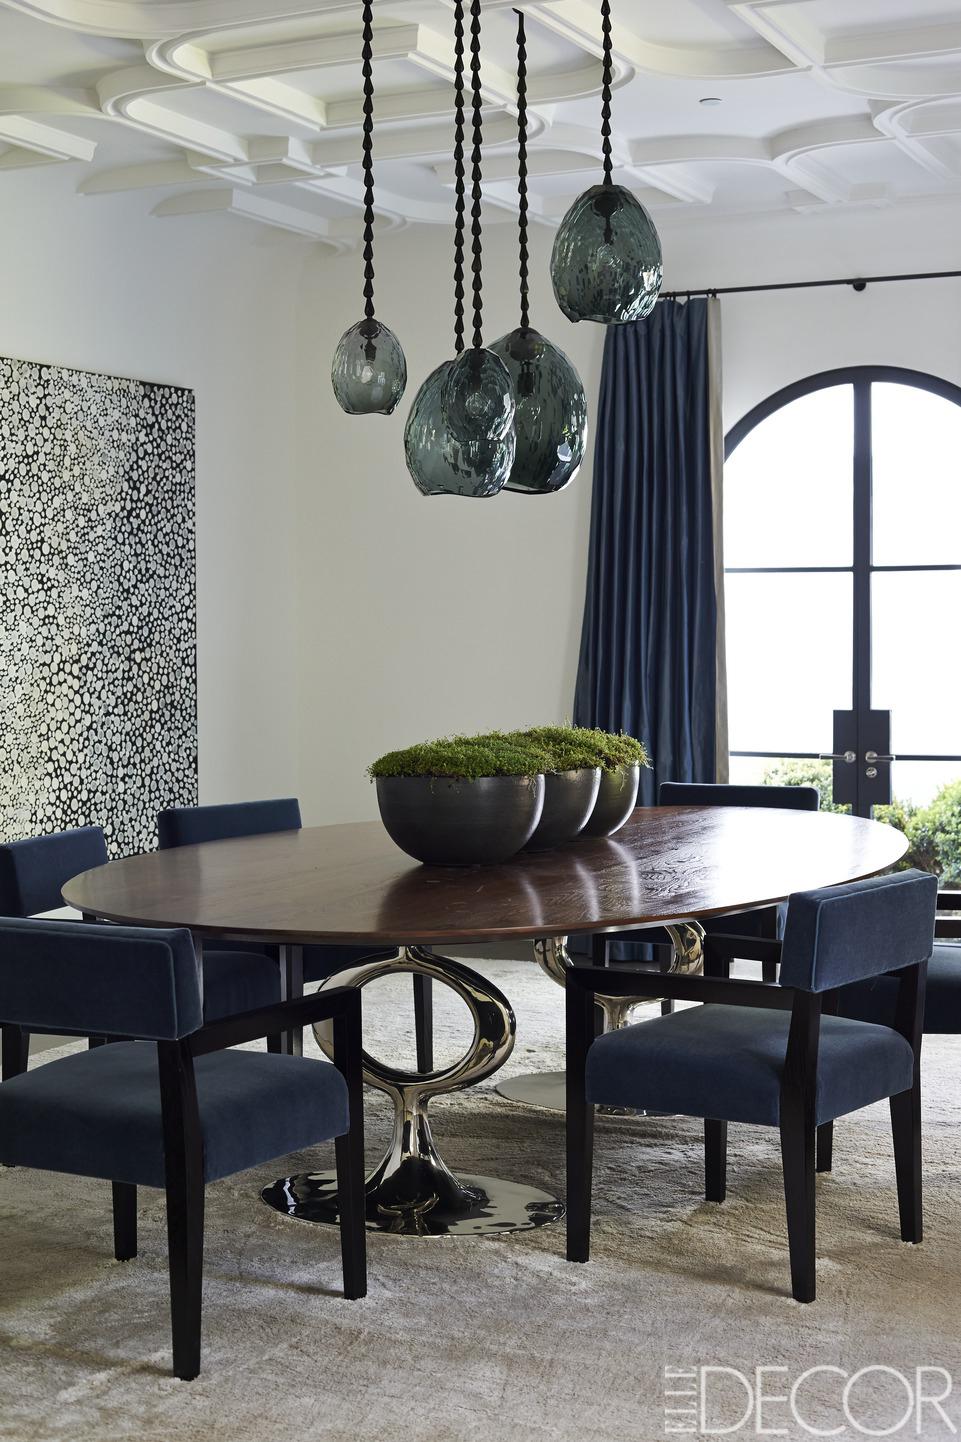 25 Modern Dining Room Decorating Ideas - Contemporary Dining Room ...